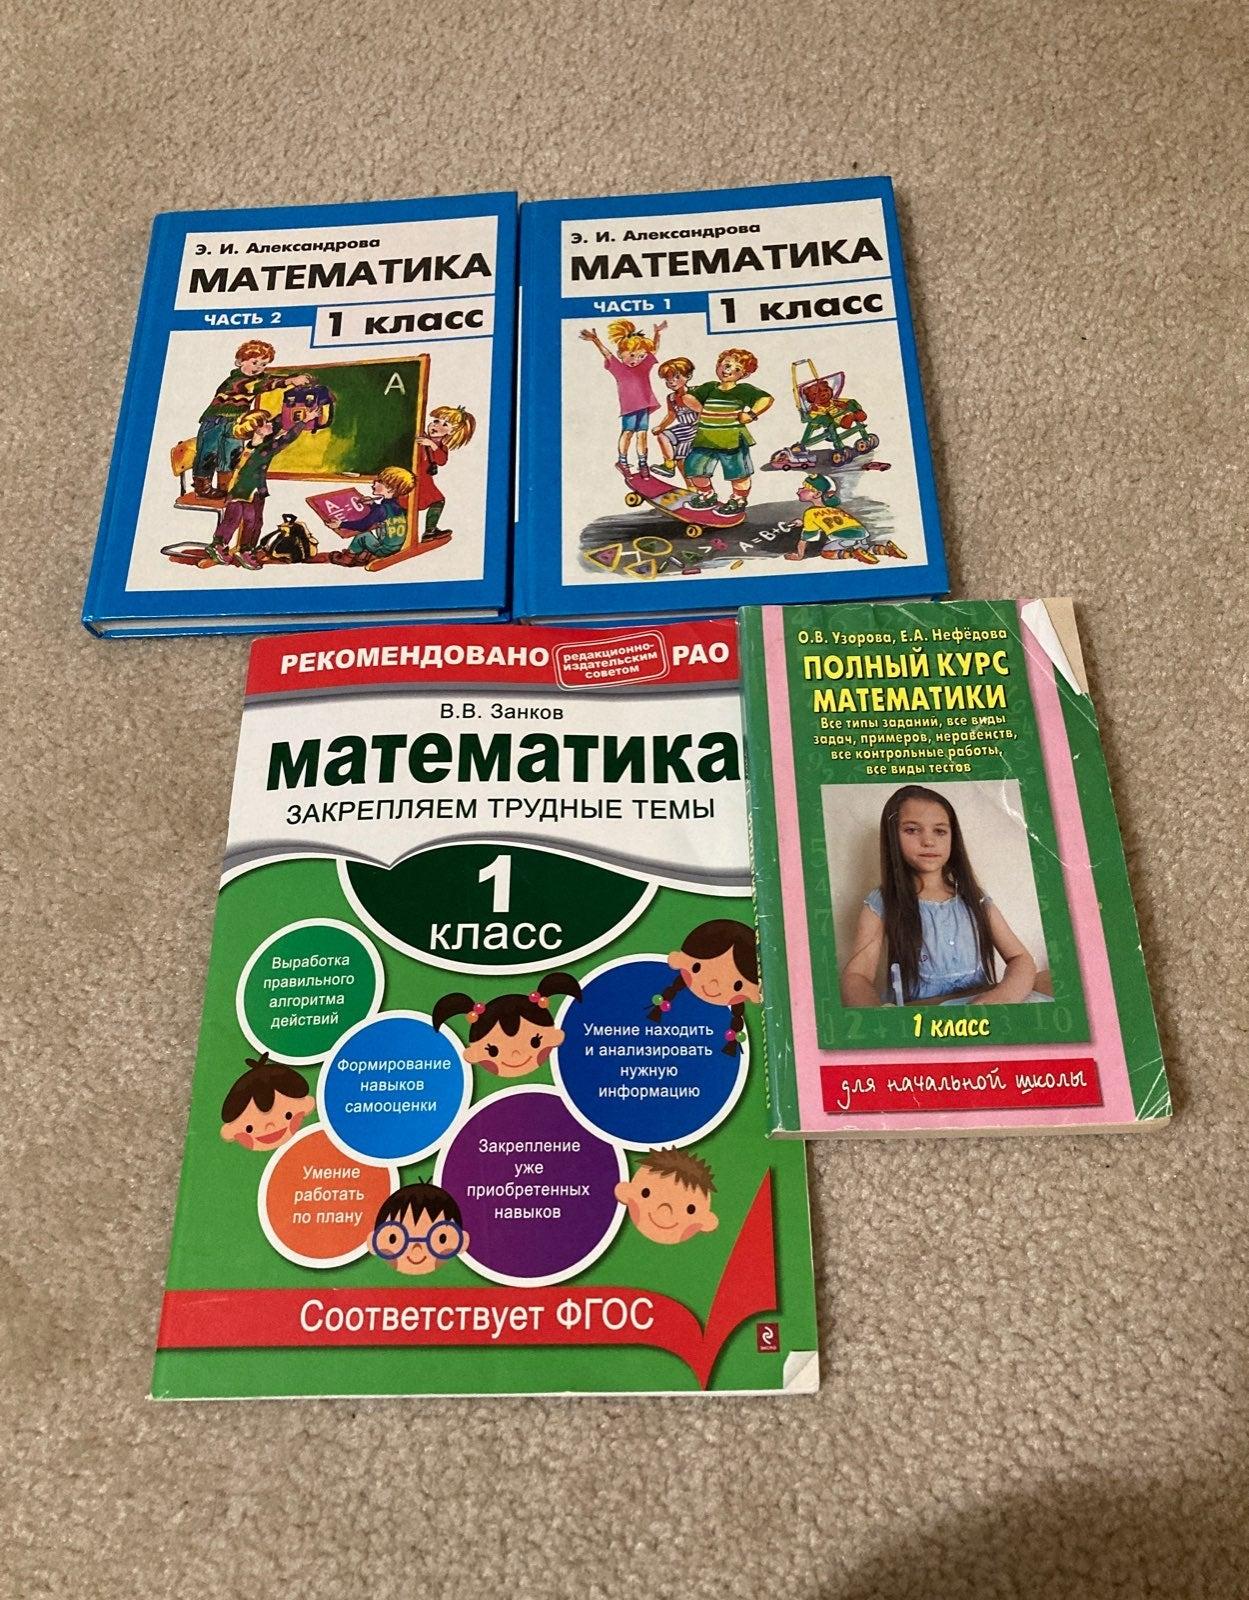 Russian Math books